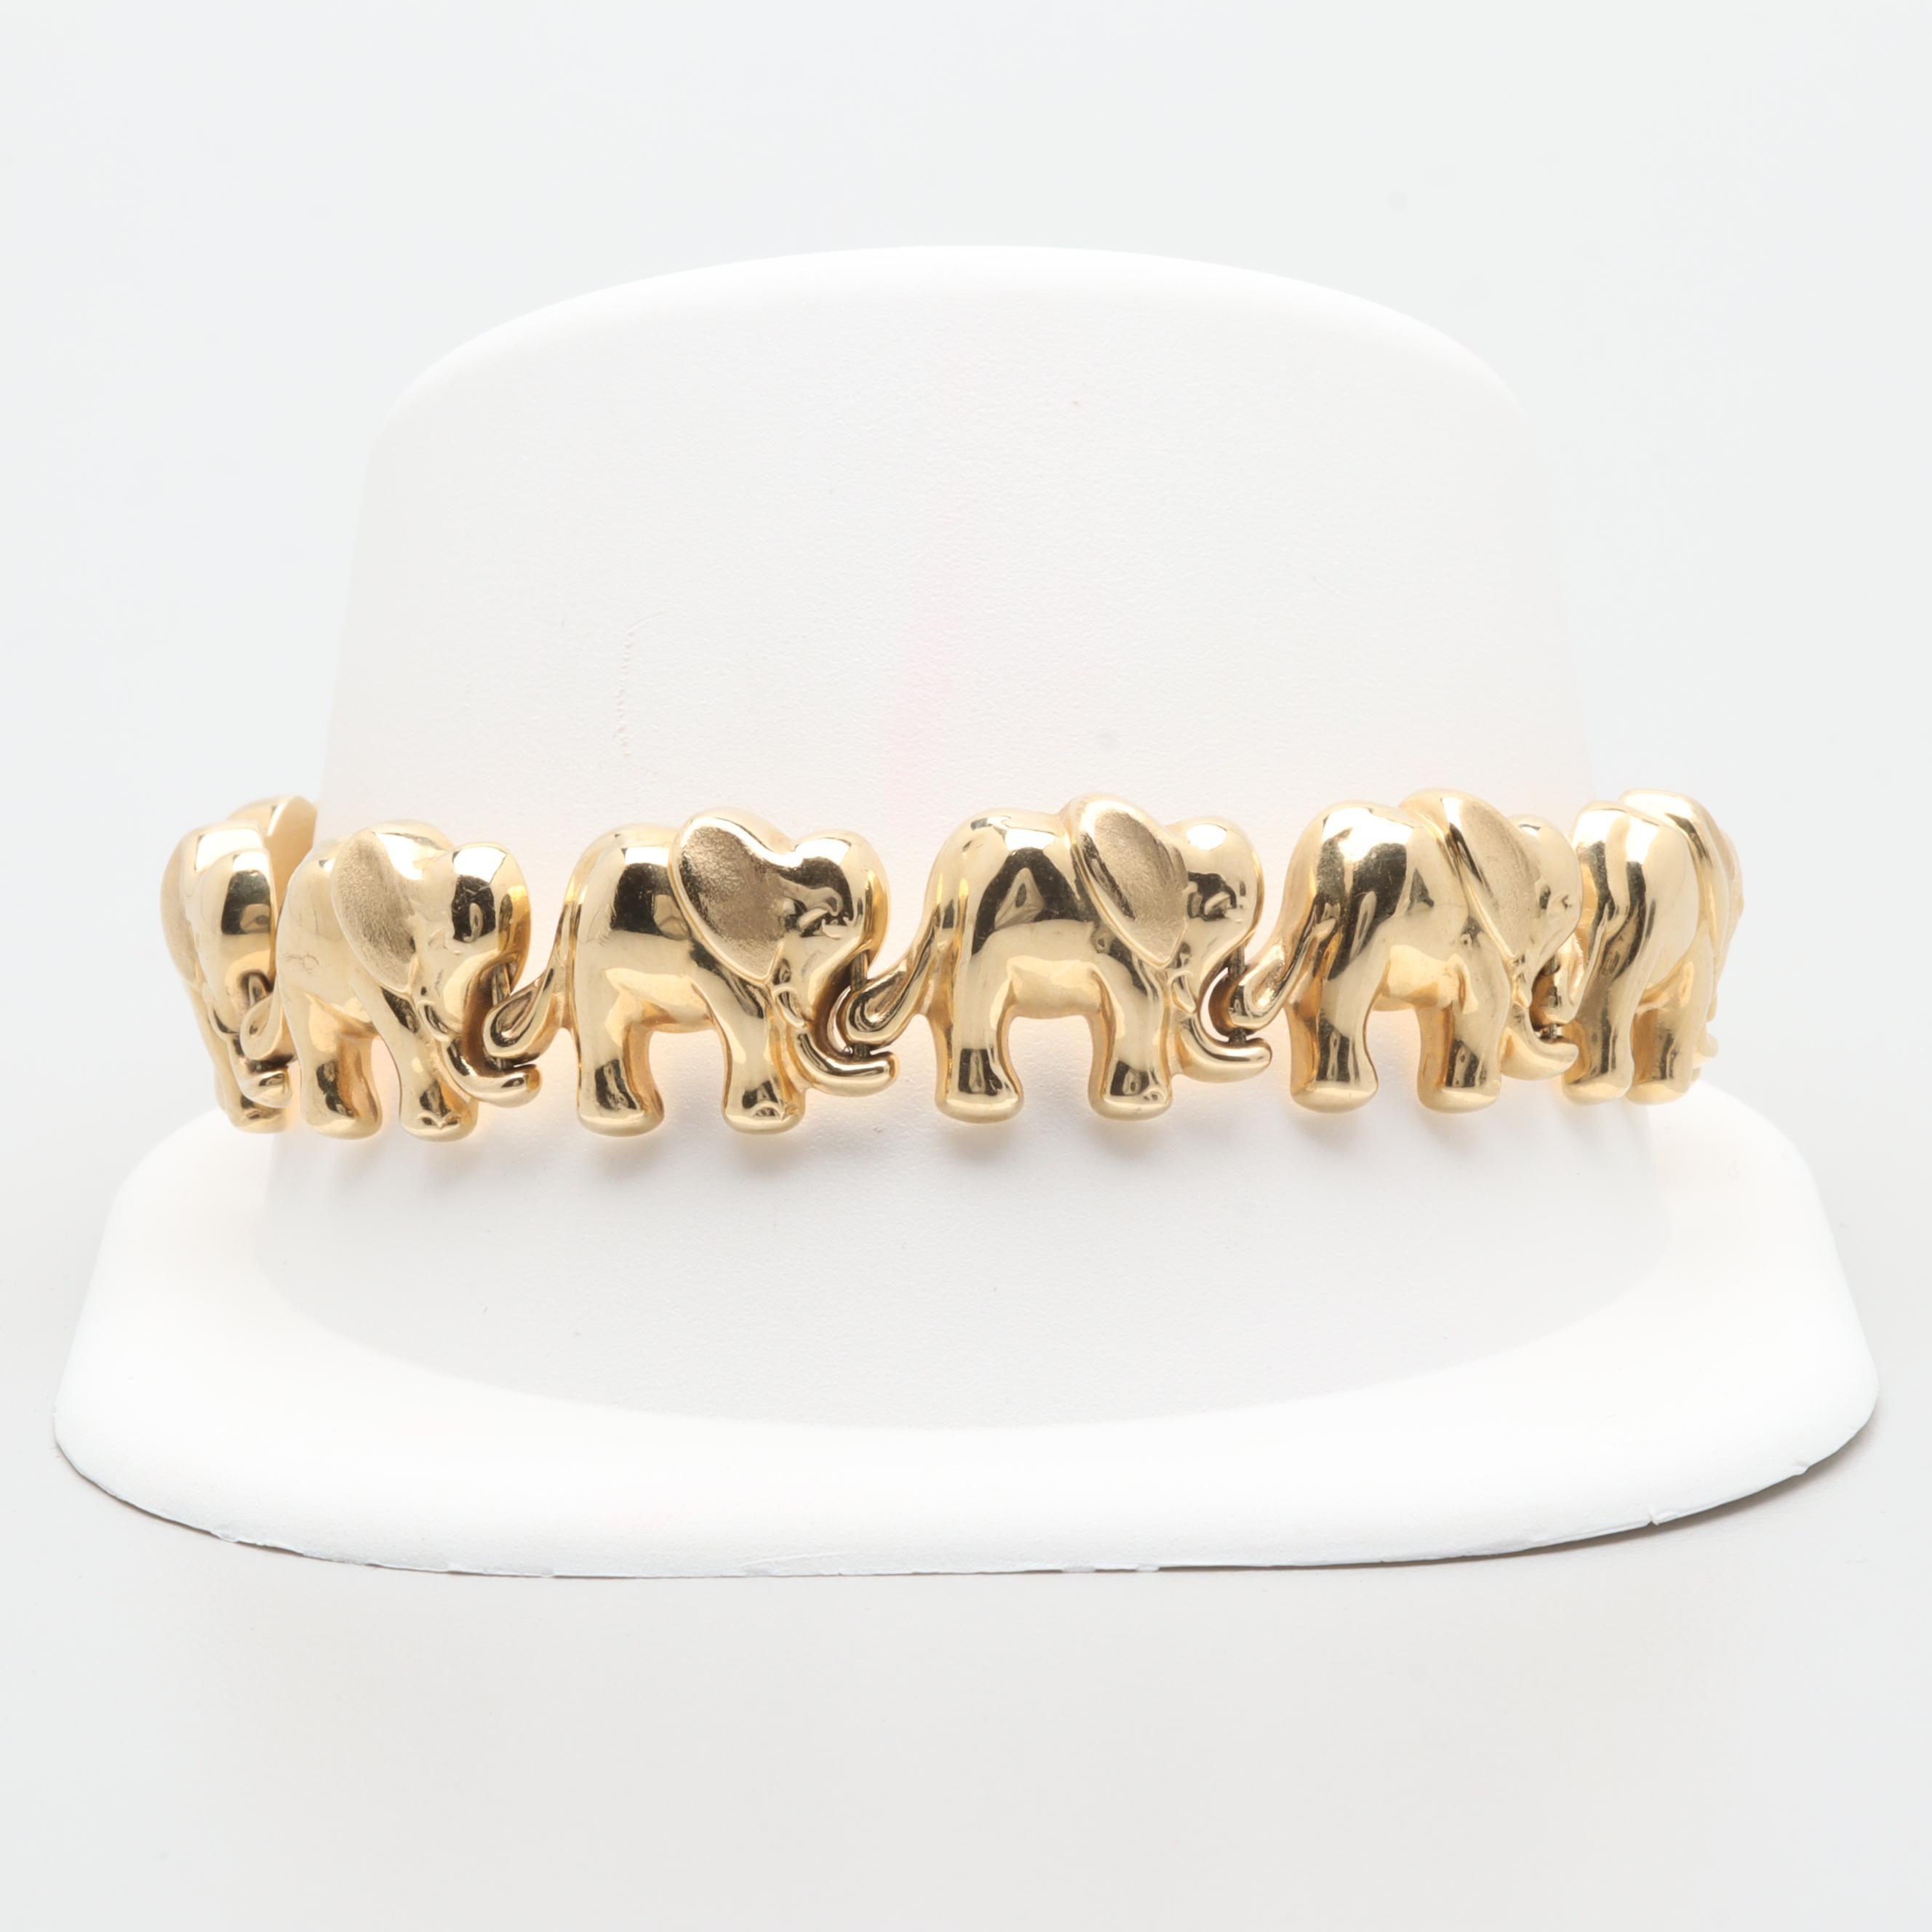 14K Yellow Gold Elephant Link Bracelet